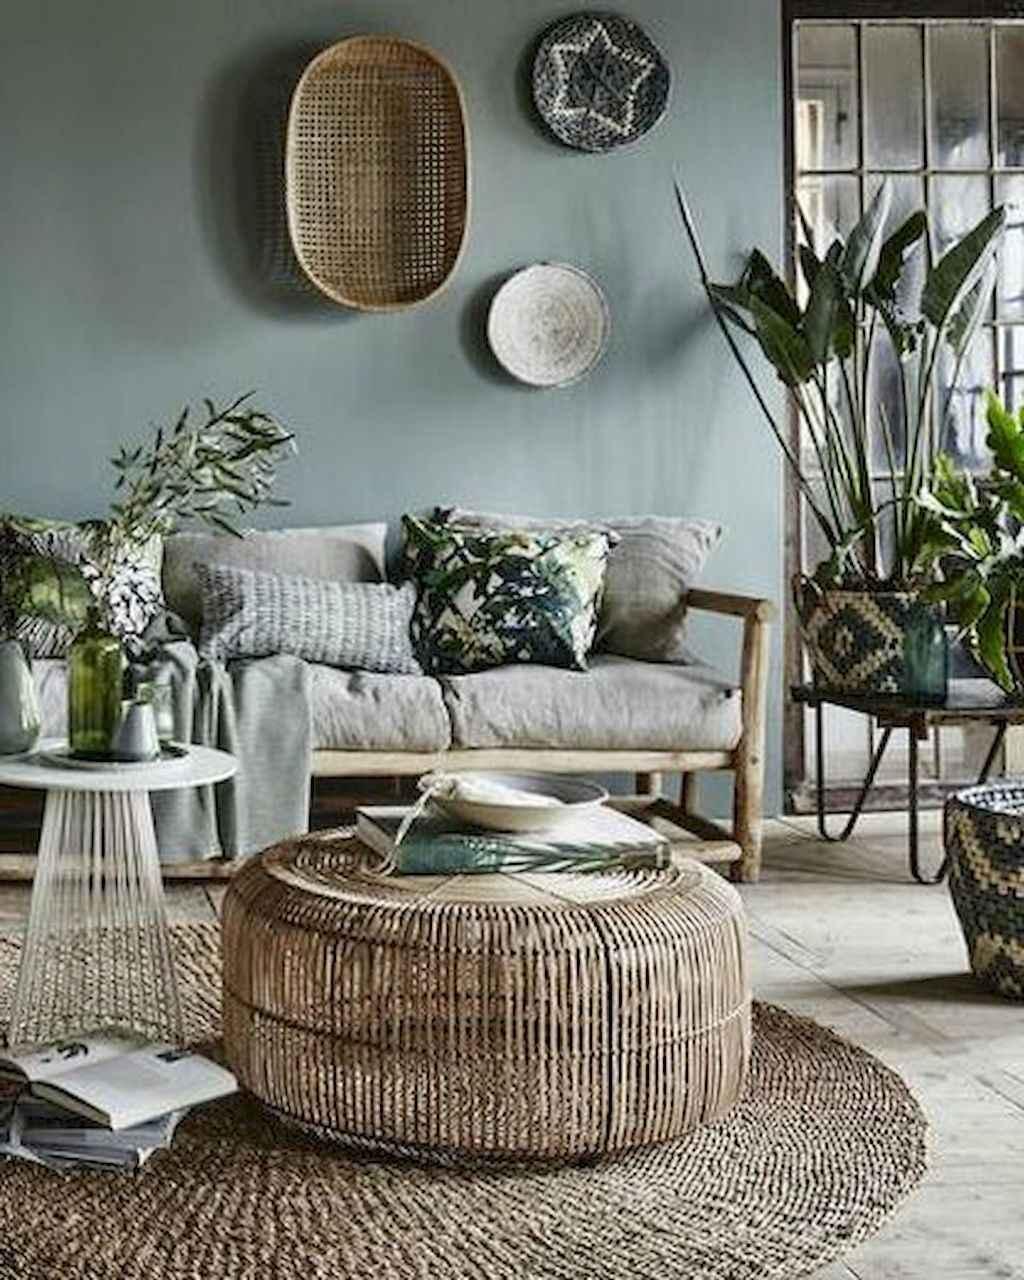 published december 28 2017 at 1024 1280 in 50 elegant rustic apartment living room decor ideas